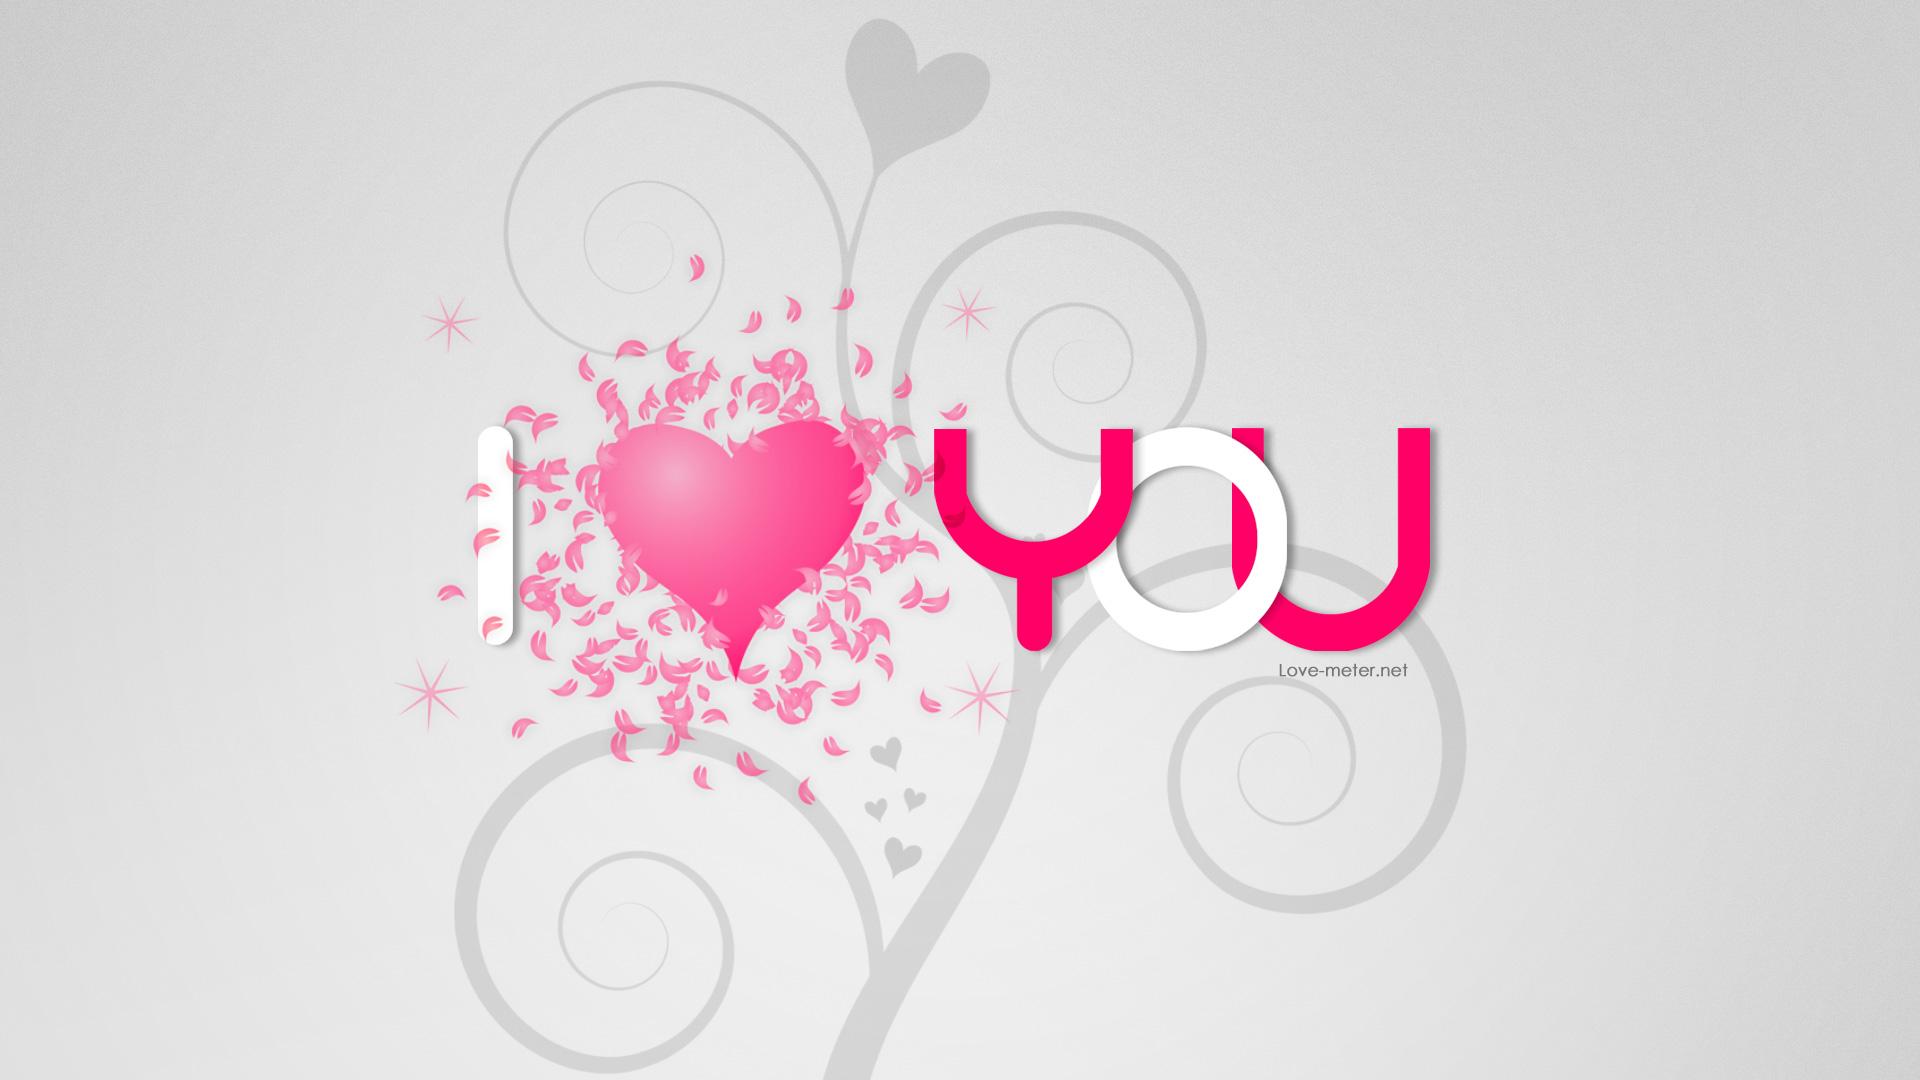 Ali 3d Name Wallpaper Free Download Love Wallpapers Download For Desktop Hd Free Love Backgrounds